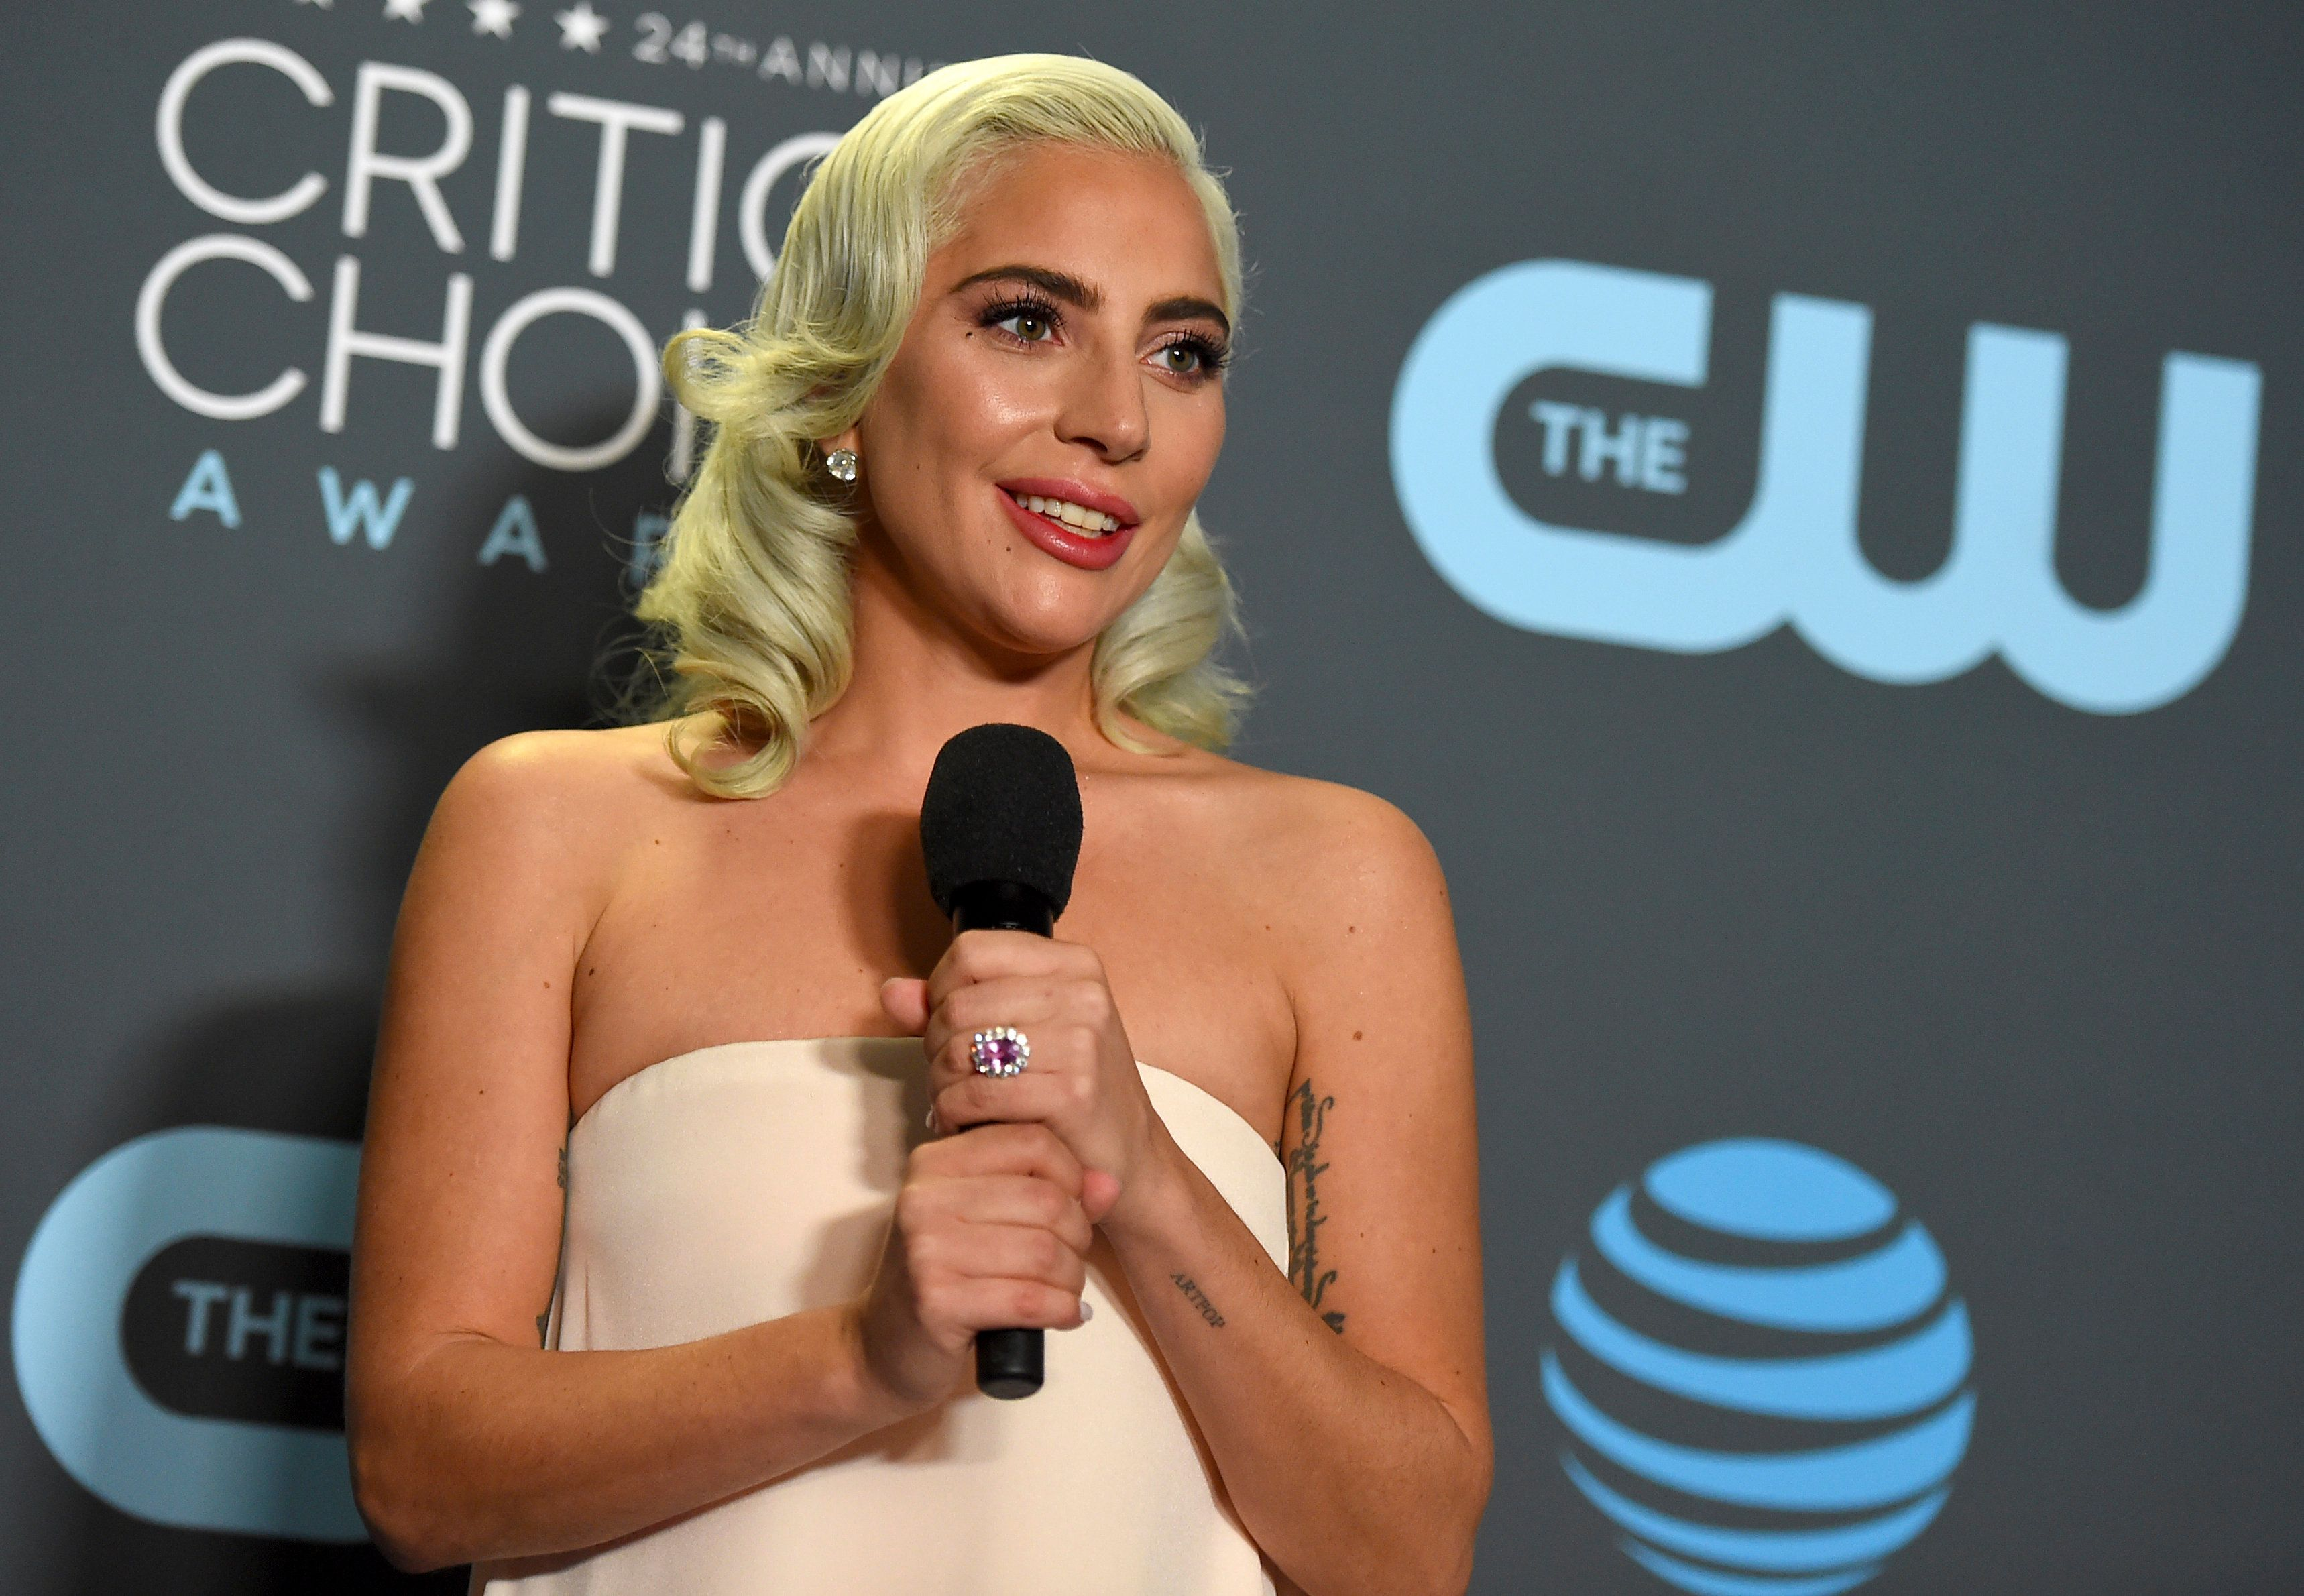 Lady Gaga, shown here at the Critics' Choice Awards on Jan. 13 in Santa Monica, California, recently...